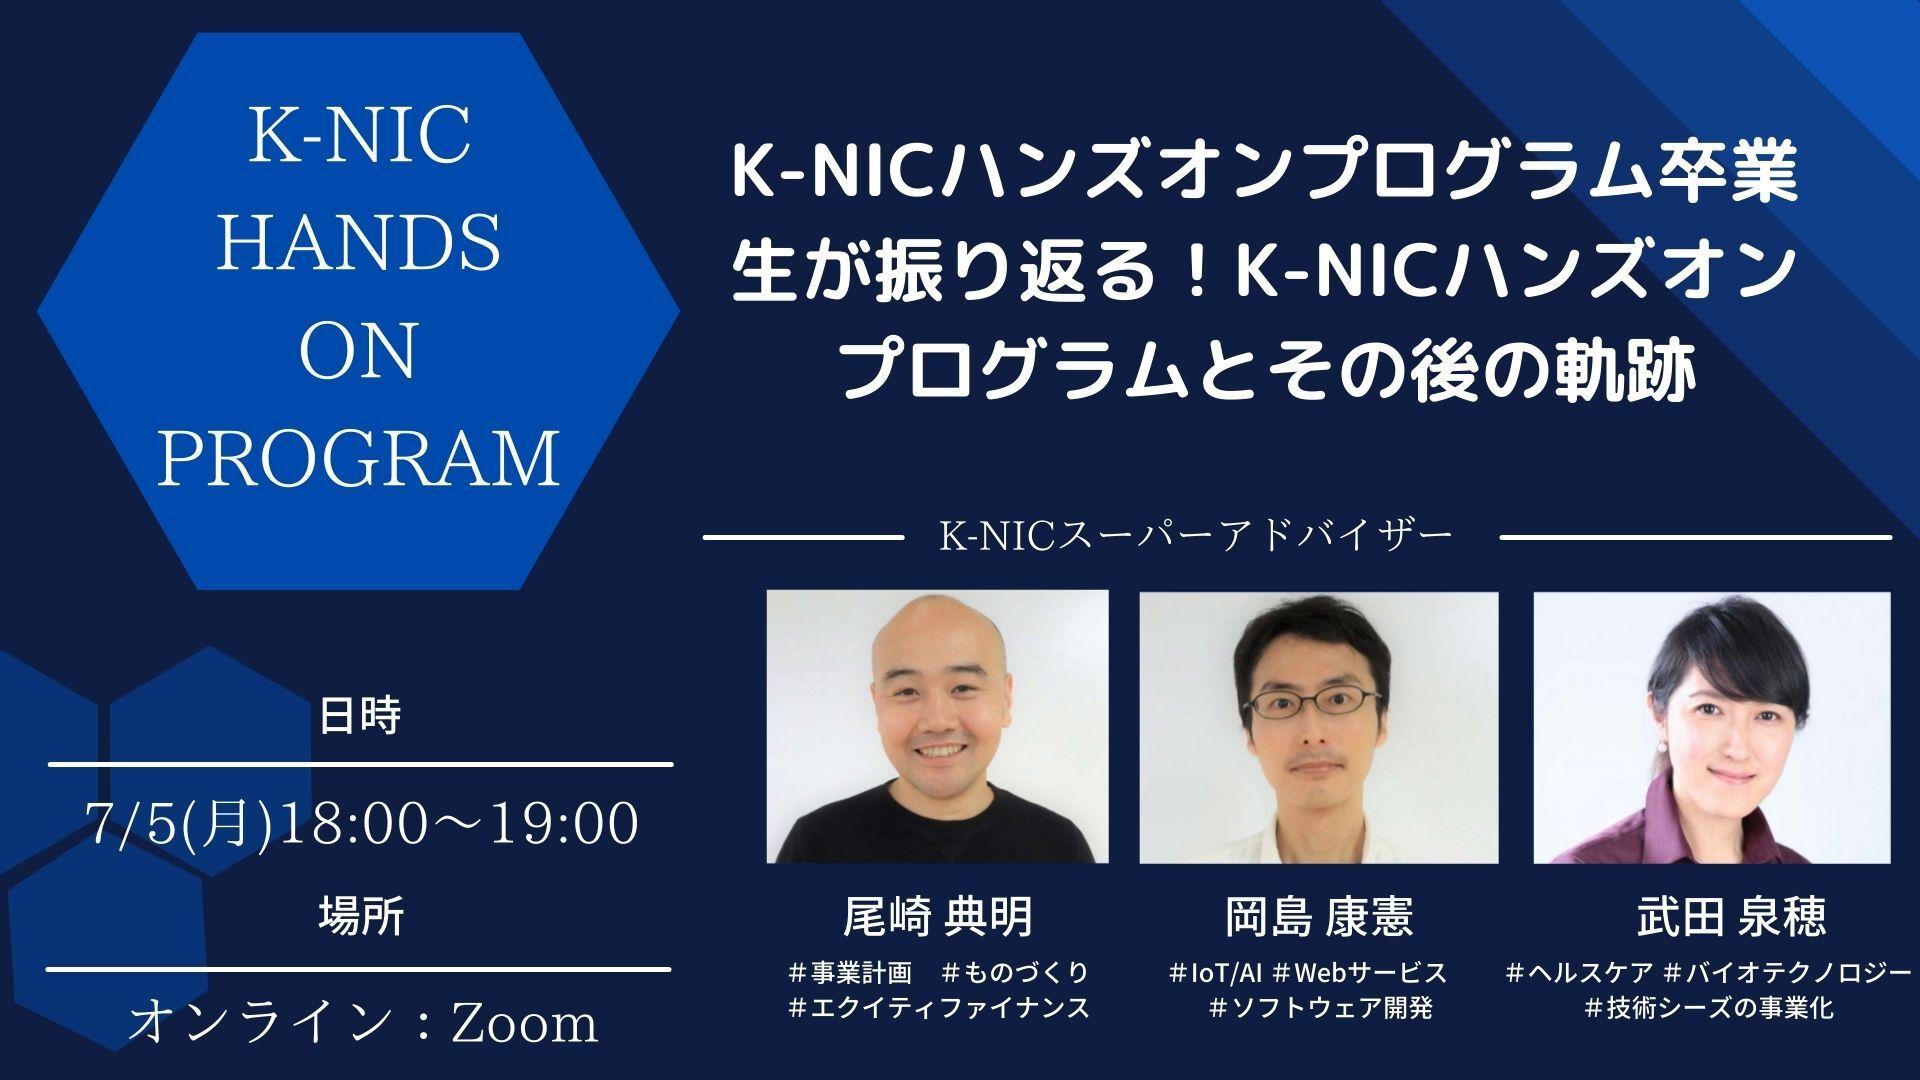 K-NIC ハンズオンプログラム卒業生が振り返る!K-NIC ハンズオンプログラムとその後の軌跡